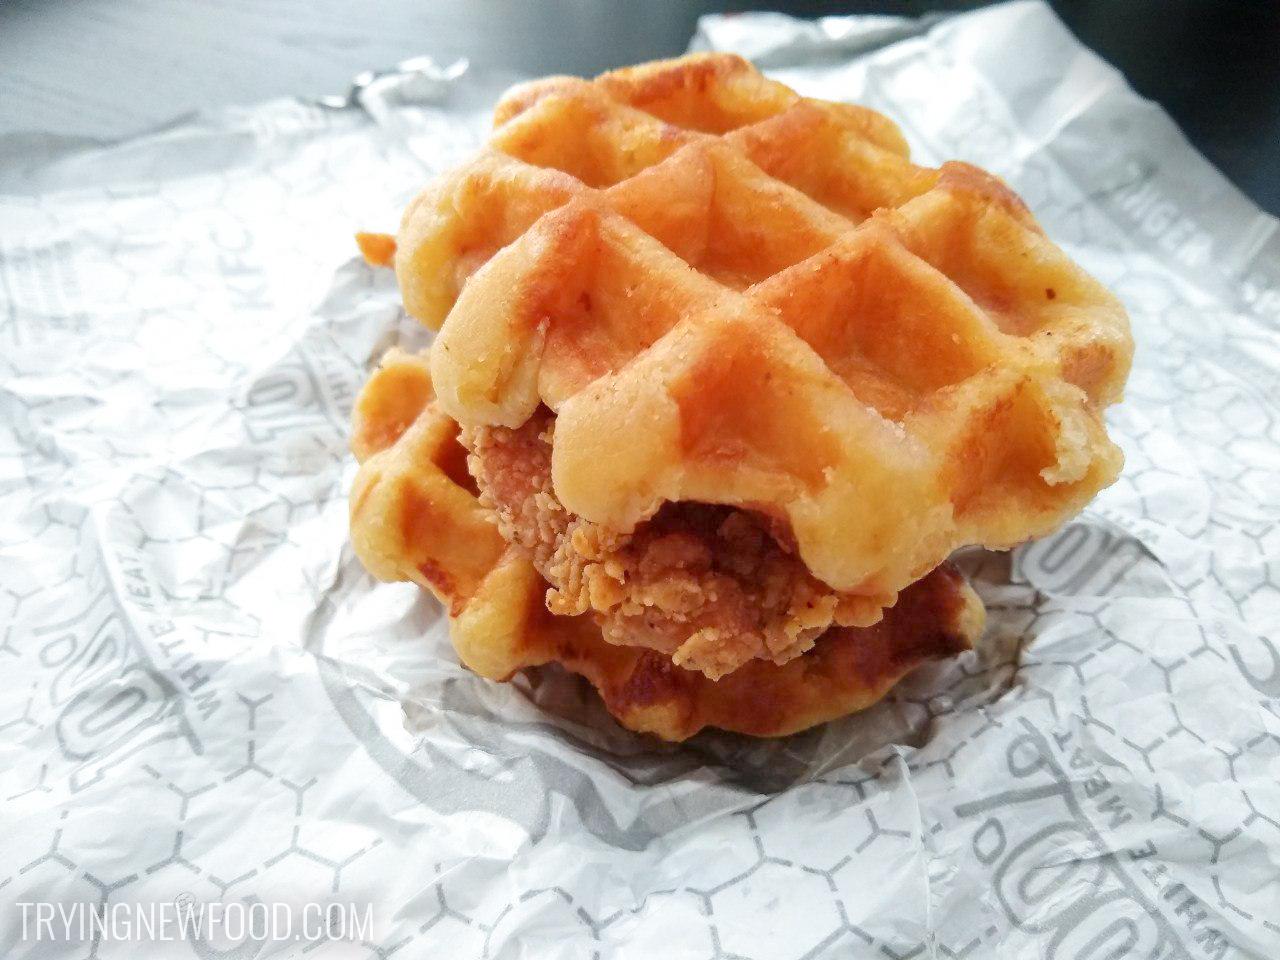 KFC Chicken & Waffles Sandwich